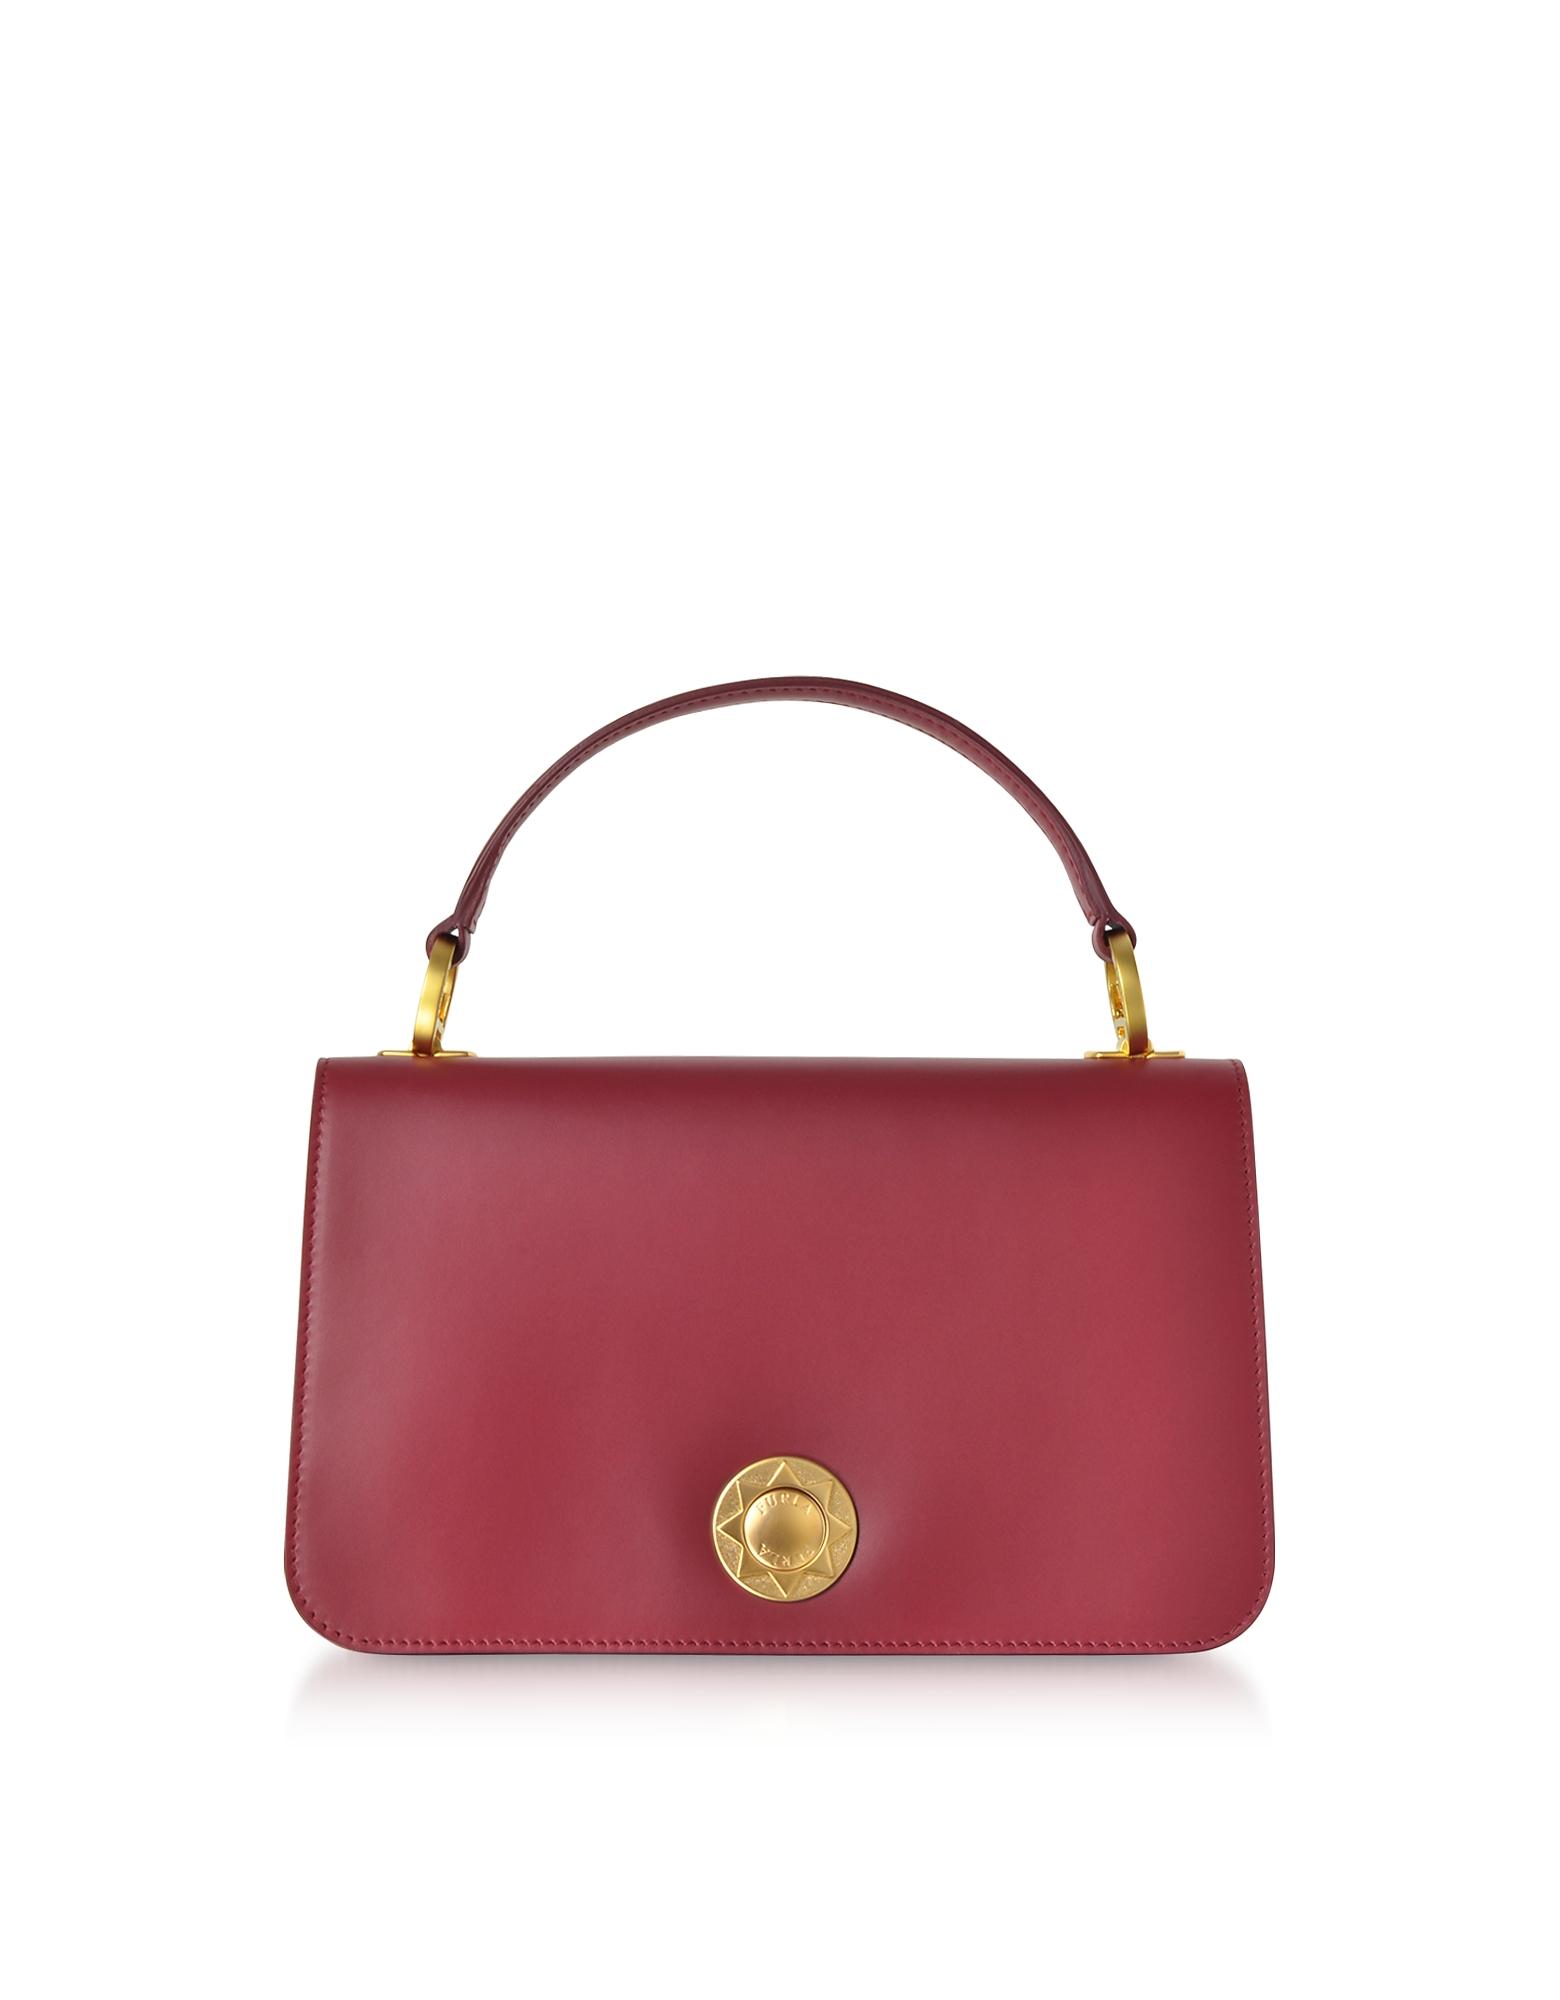 Luna Small Top Handle Bag in Cherry